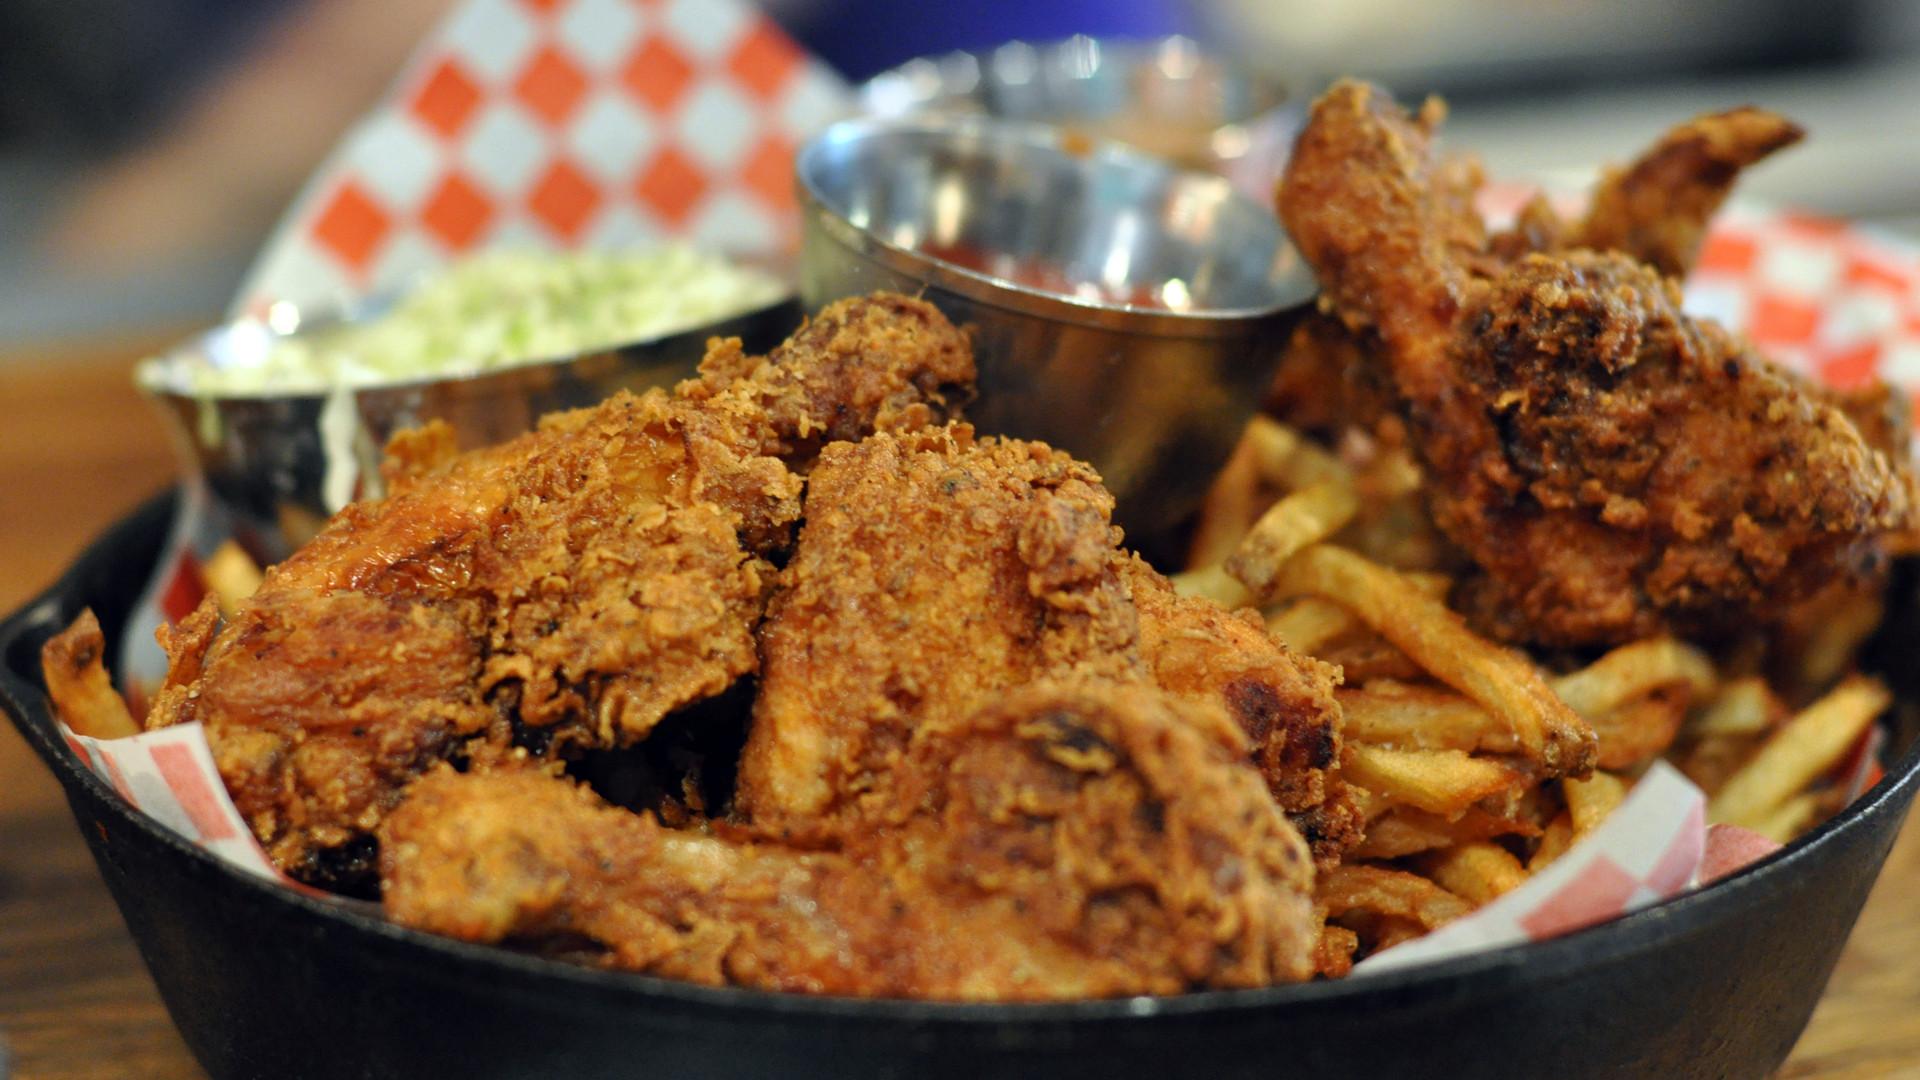 Best BBQ restaurants in Toronto: The Stockyards